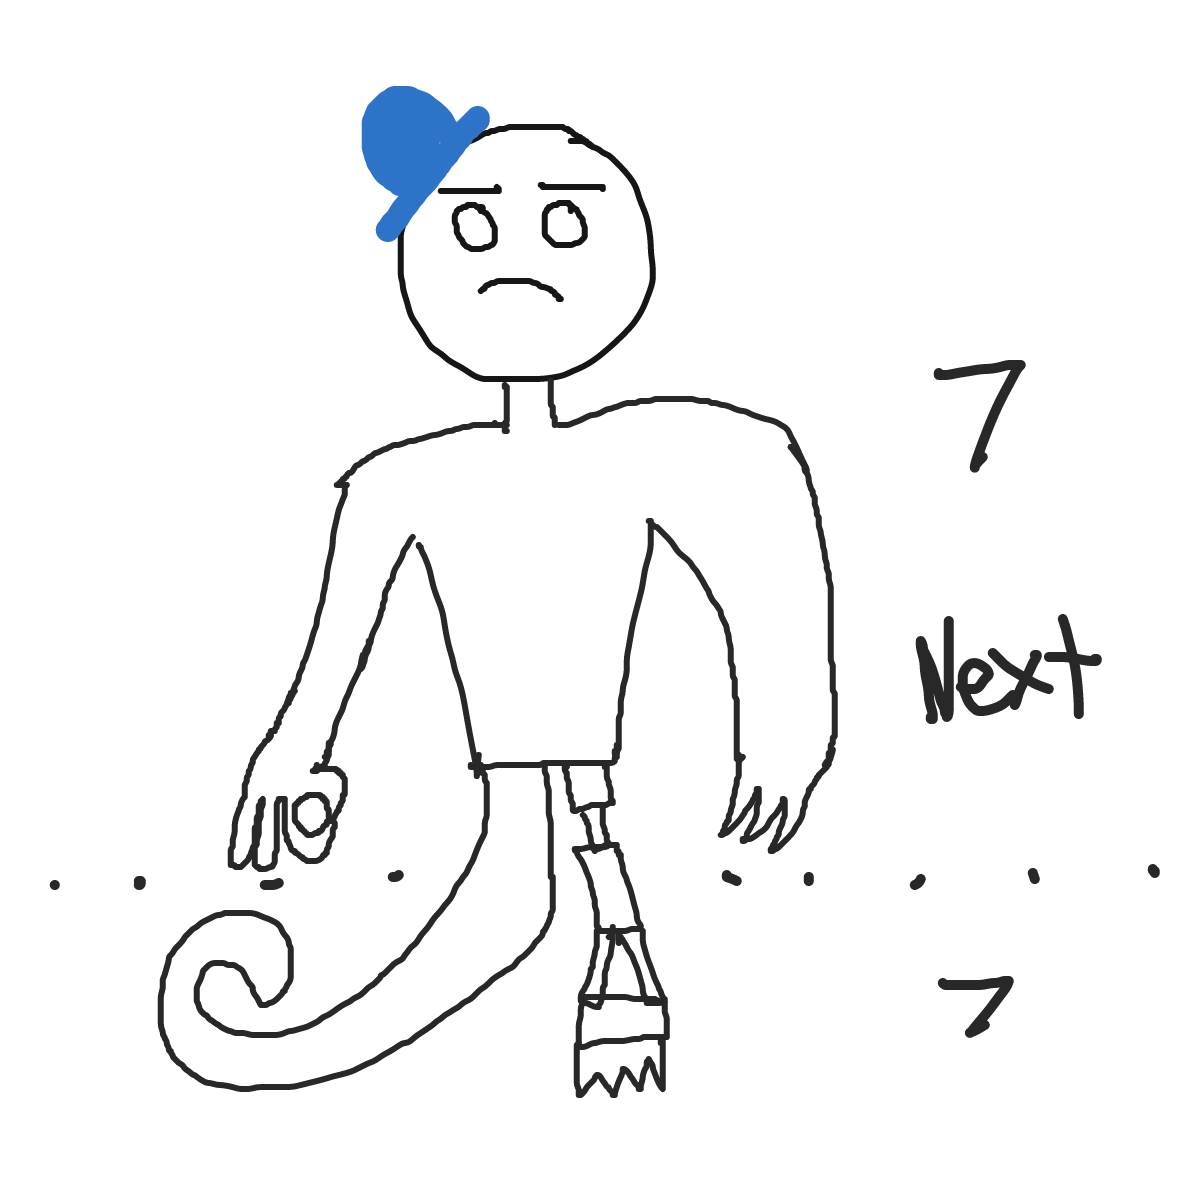 Drawing in Add Body parts limb by limb by SamMcJam